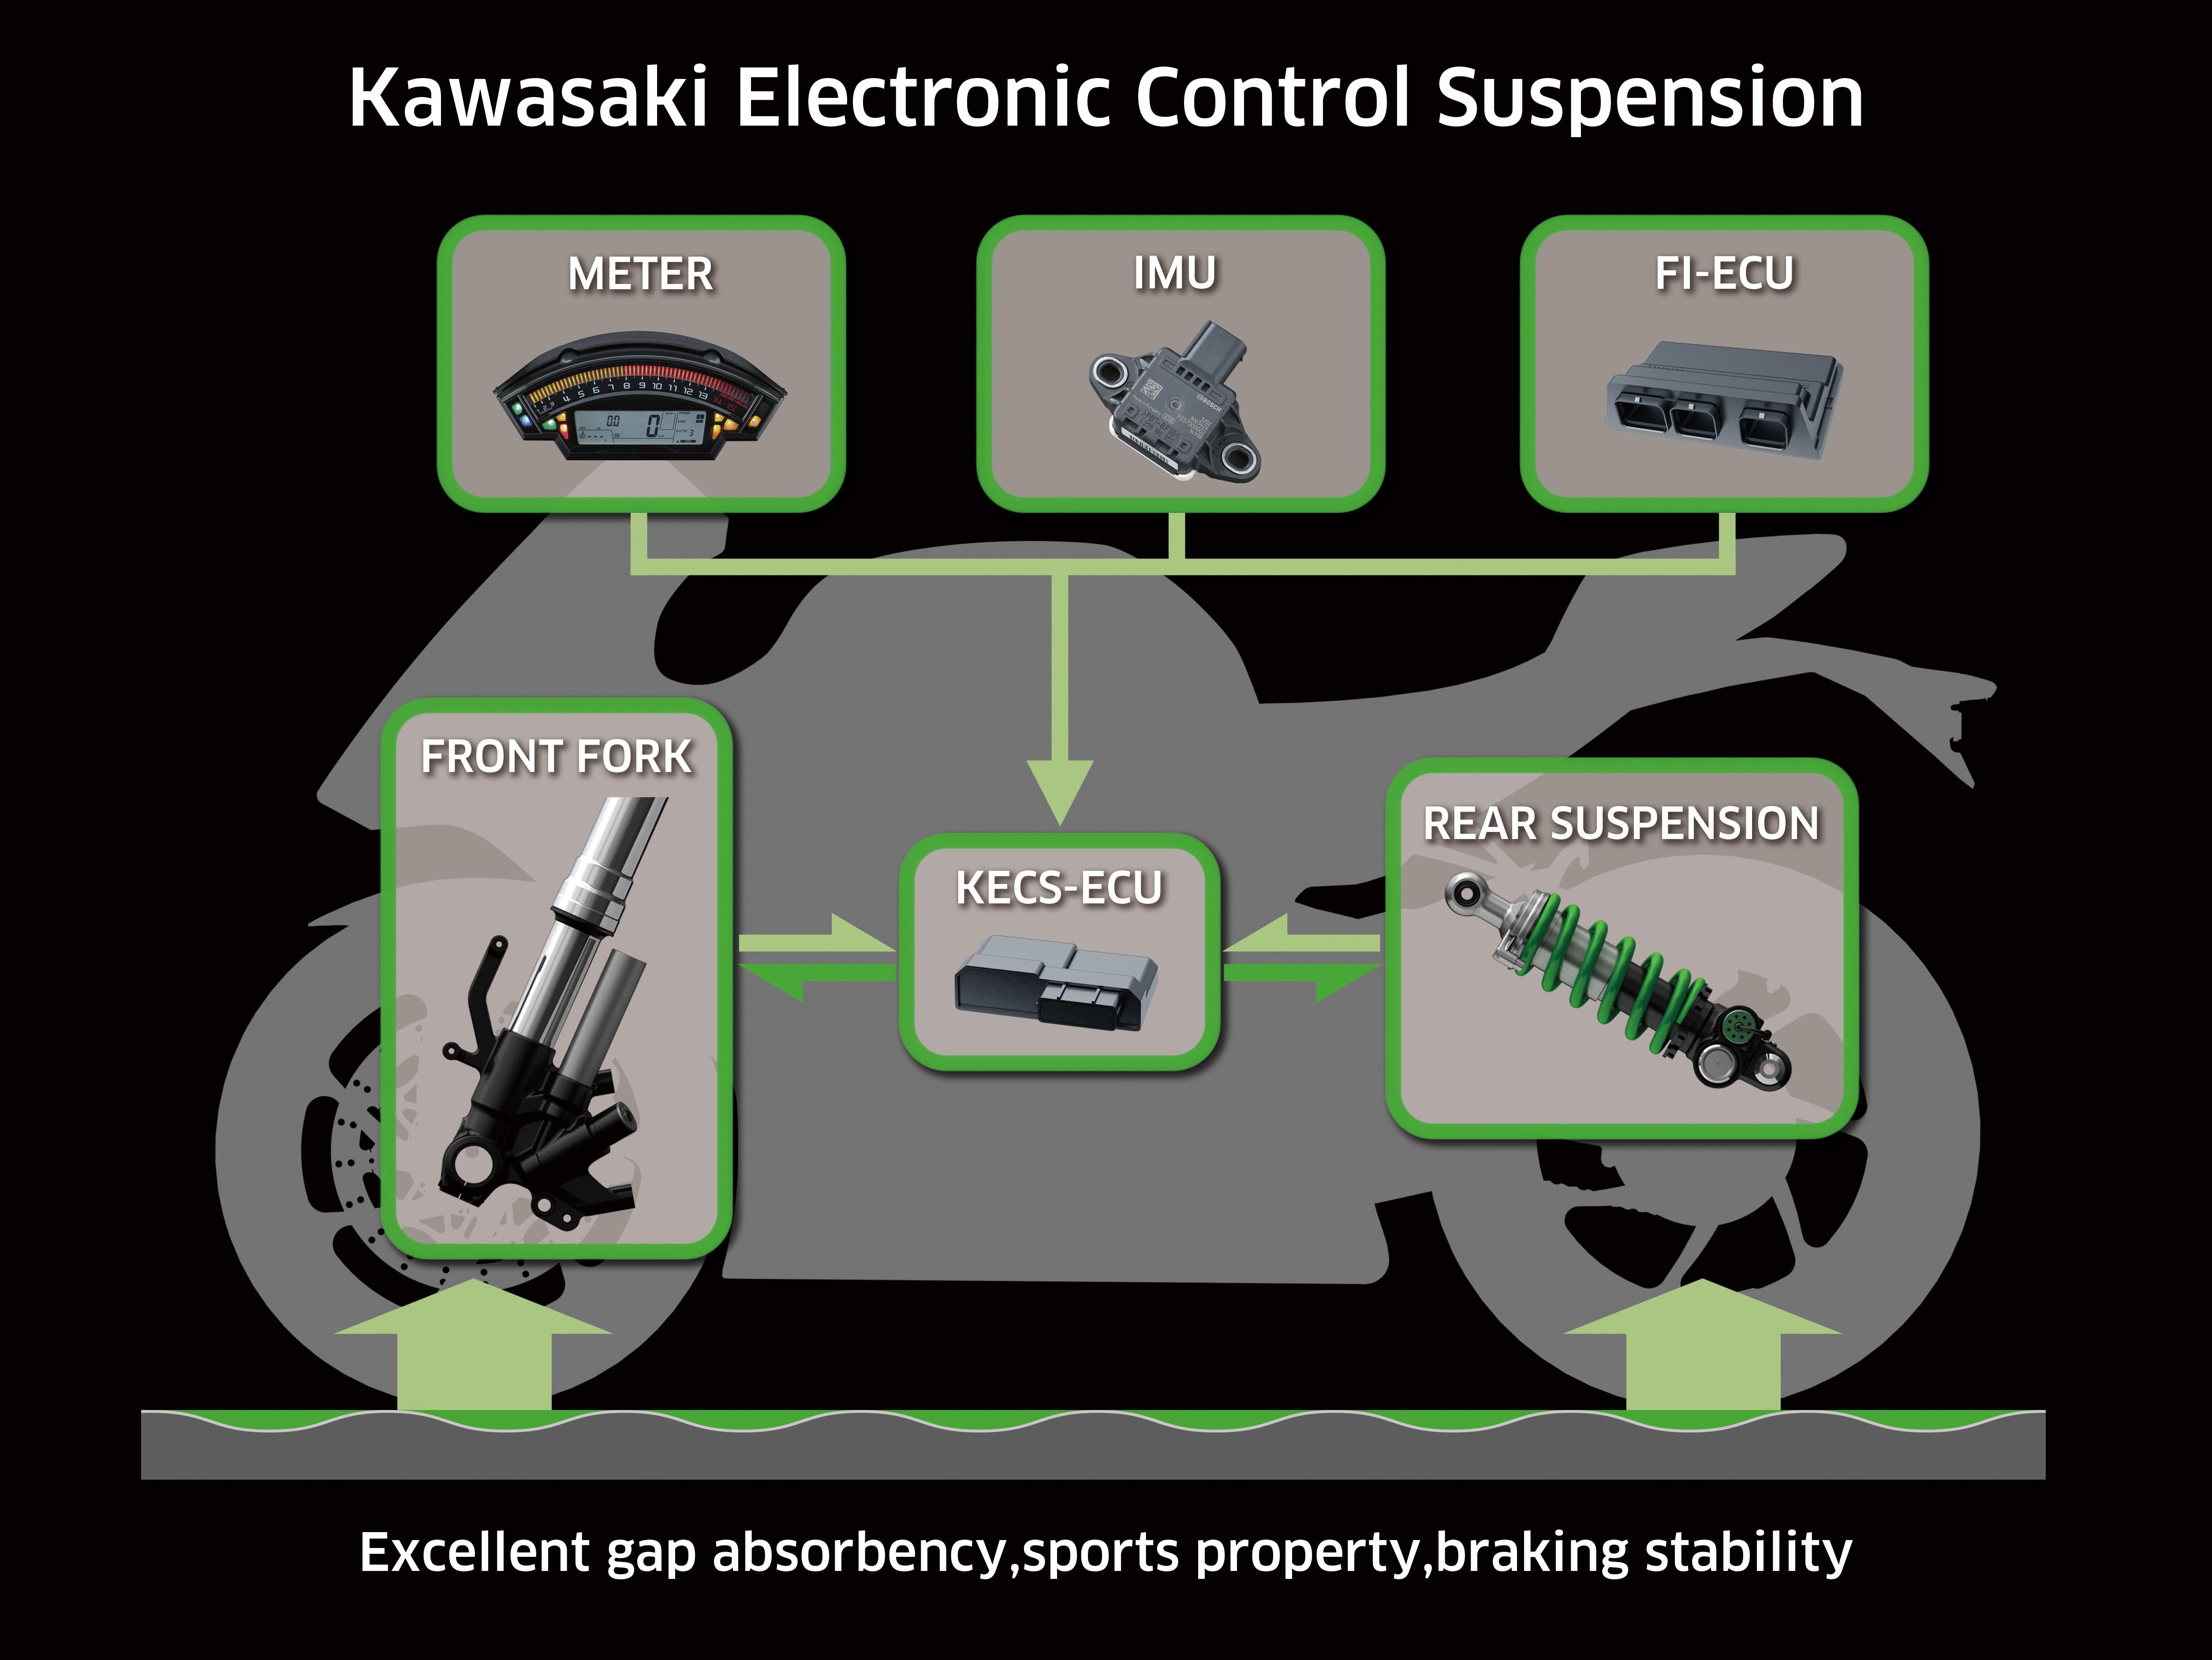 Kawasaki electonic control suspension features